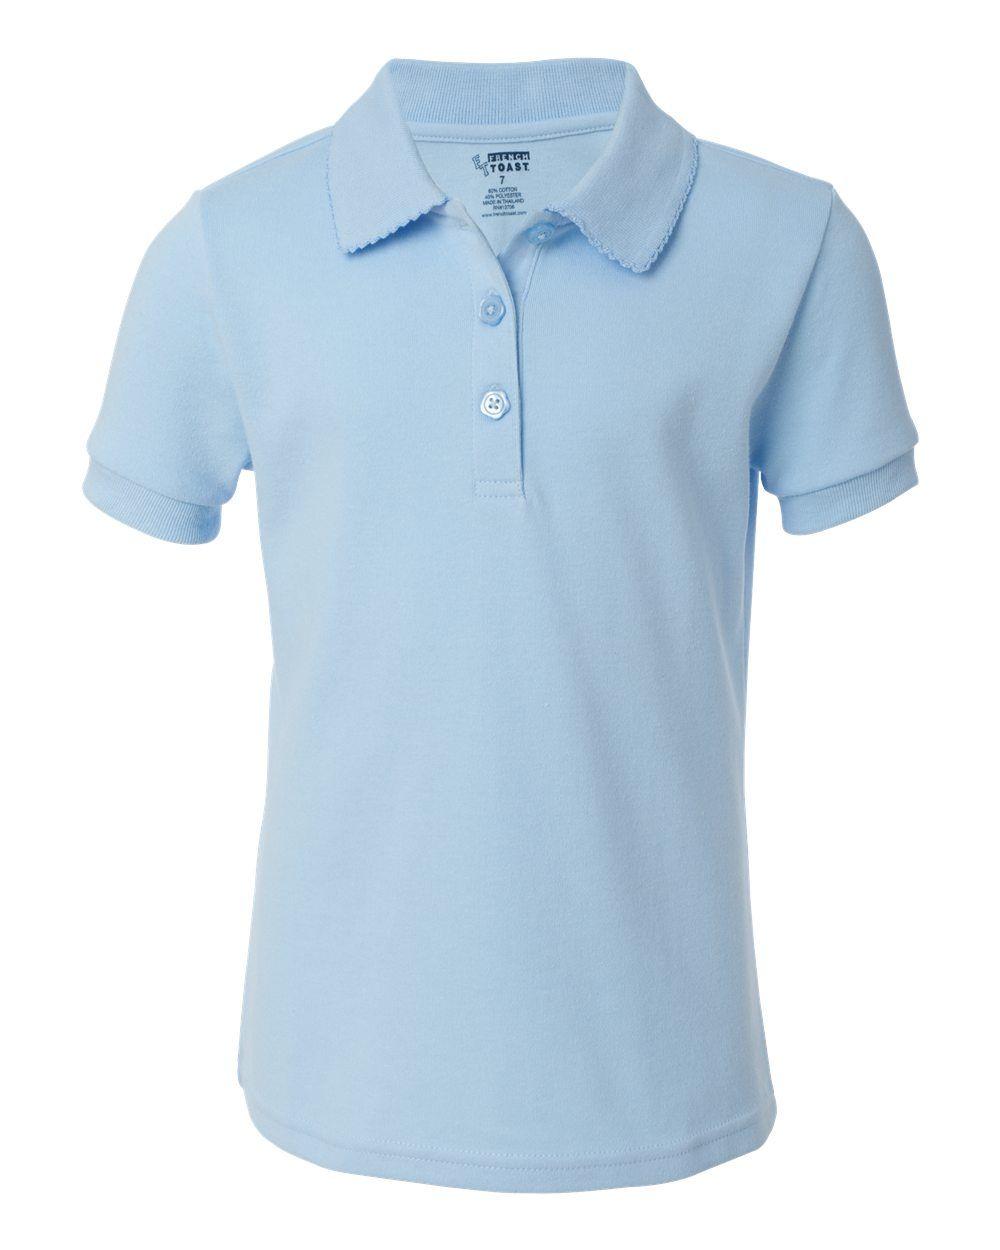 e938ef284bdcc blue polo shirt - Google Search